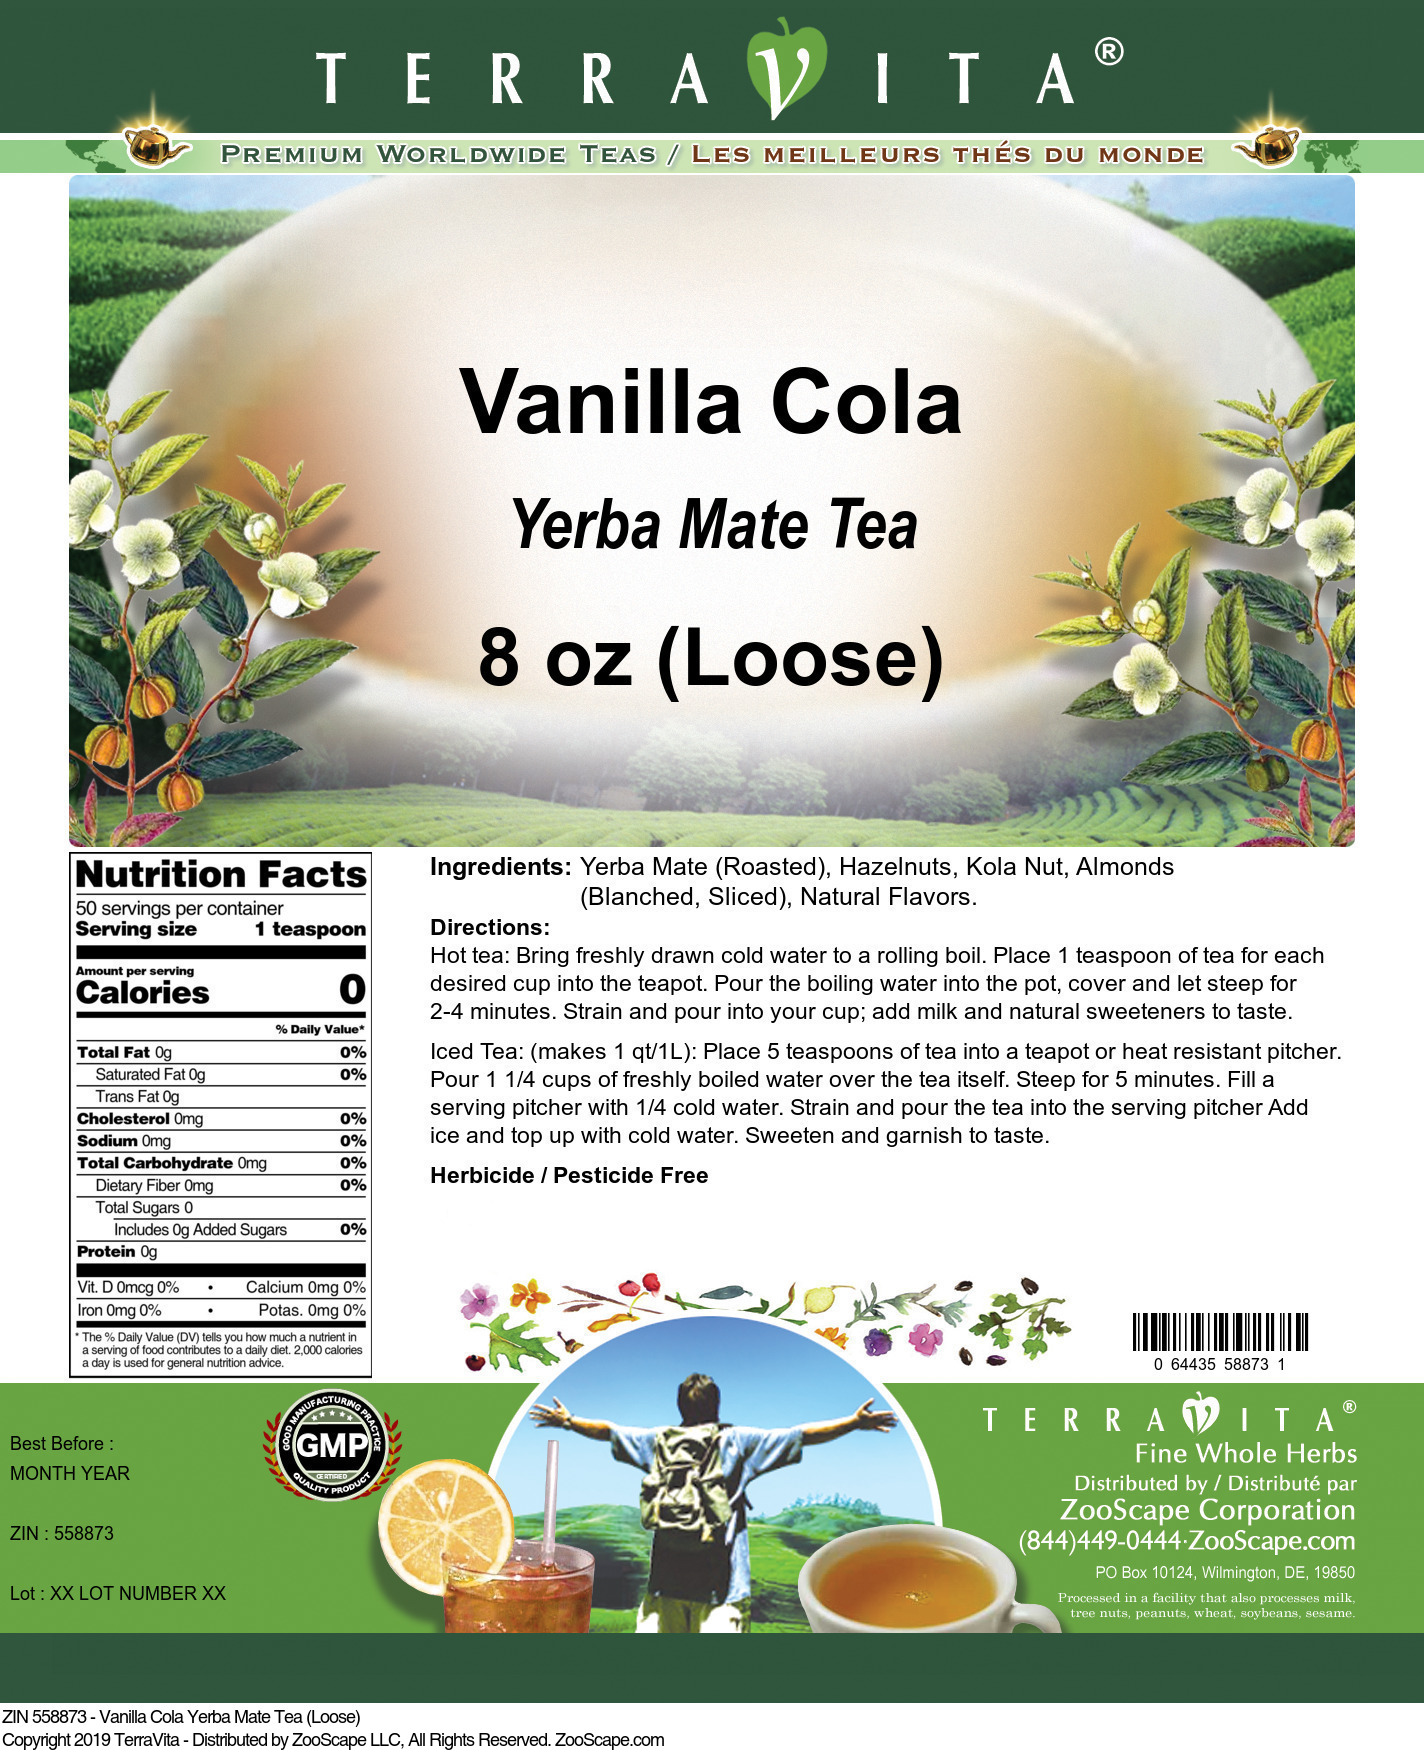 Vanilla Cola Yerba Mate